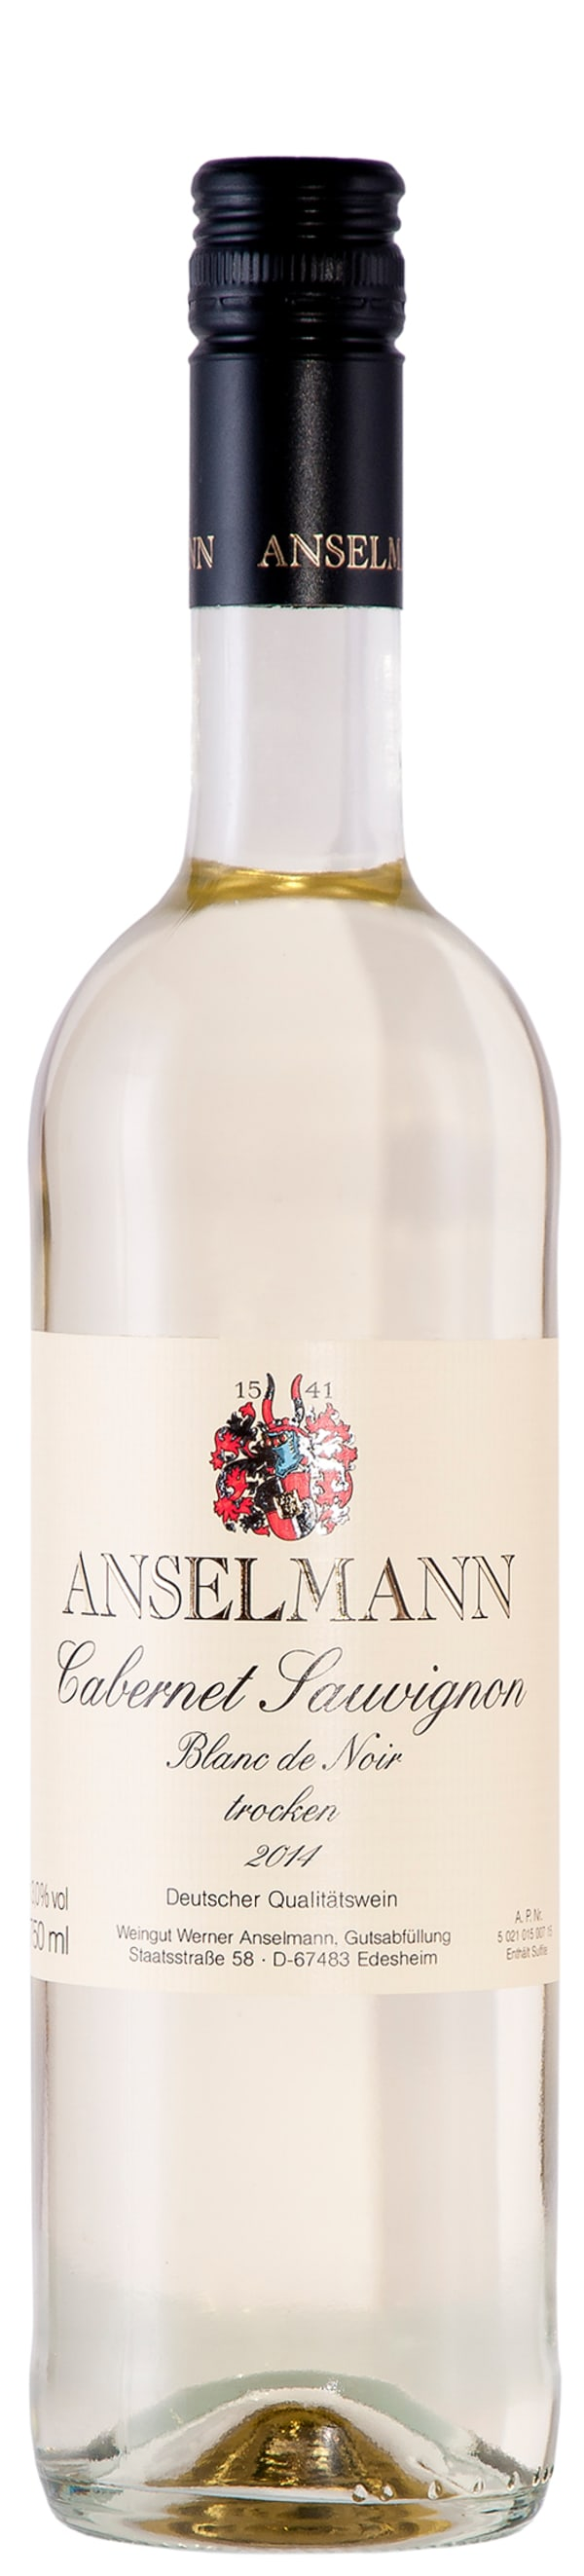 Anselmann Cabernet Sauvignon Blanc de Noir 2018